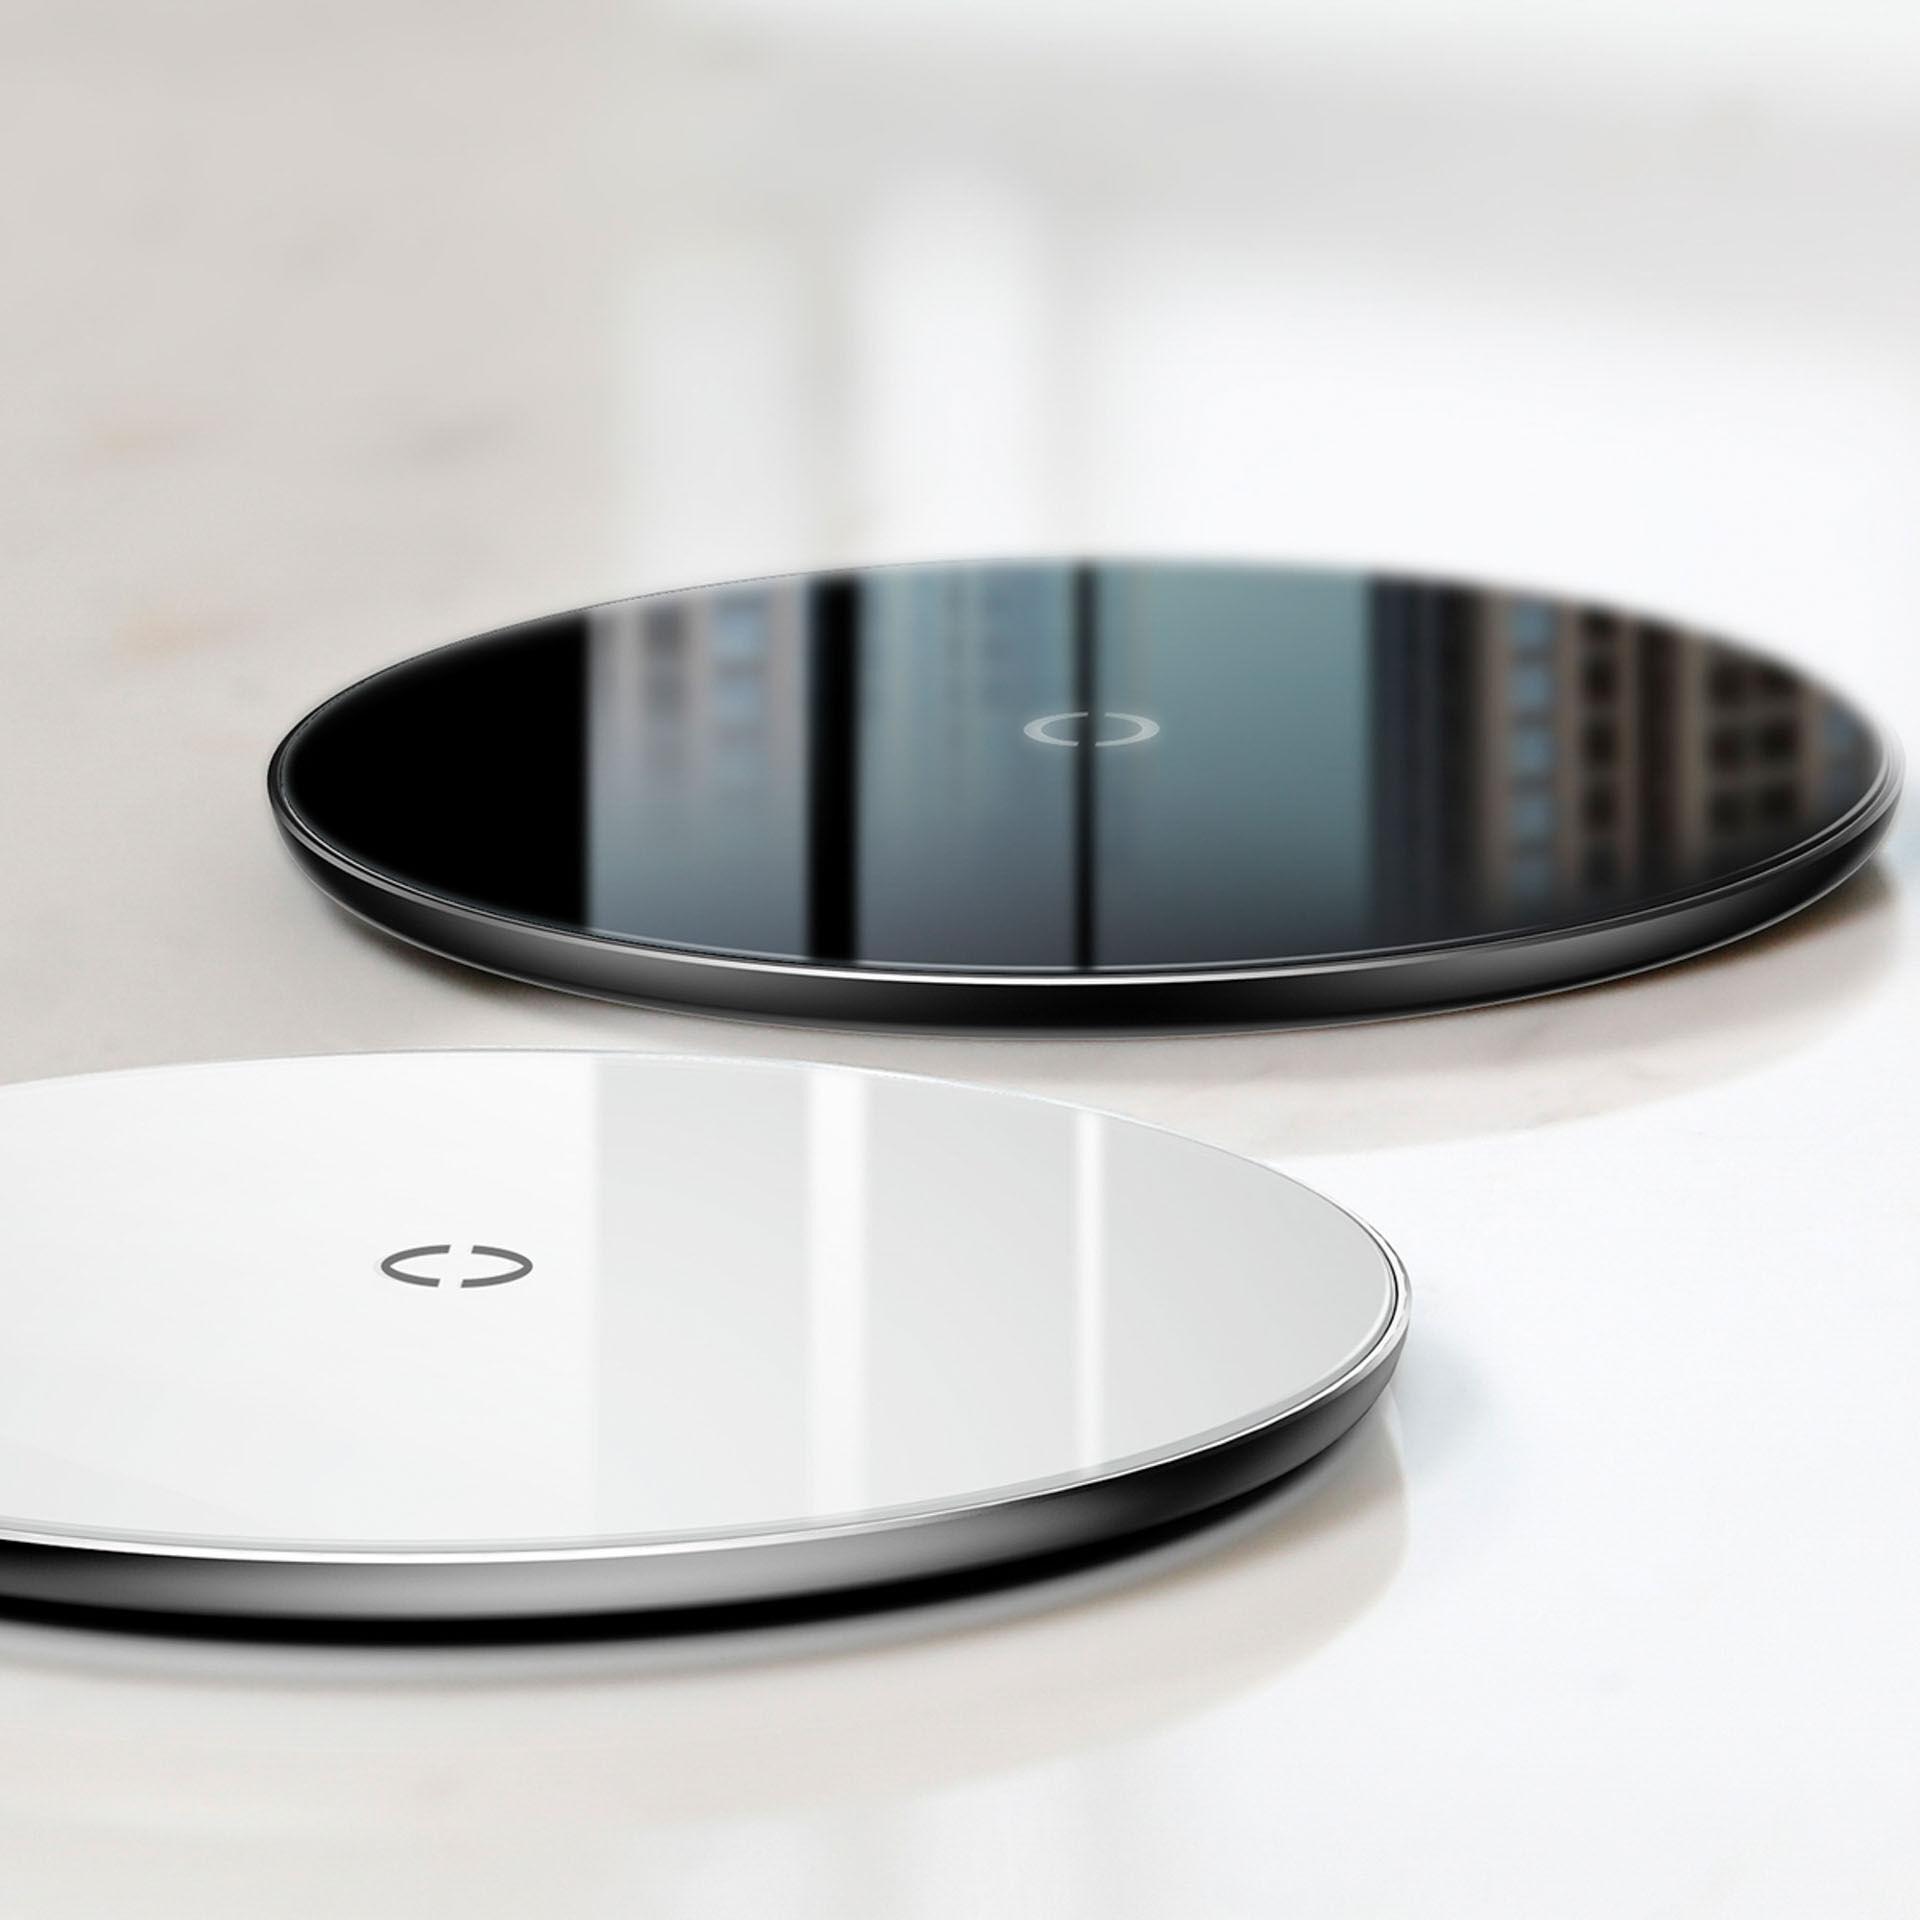 miniatura 17 - Caricabatterie wireless ultra sottile per smartphone